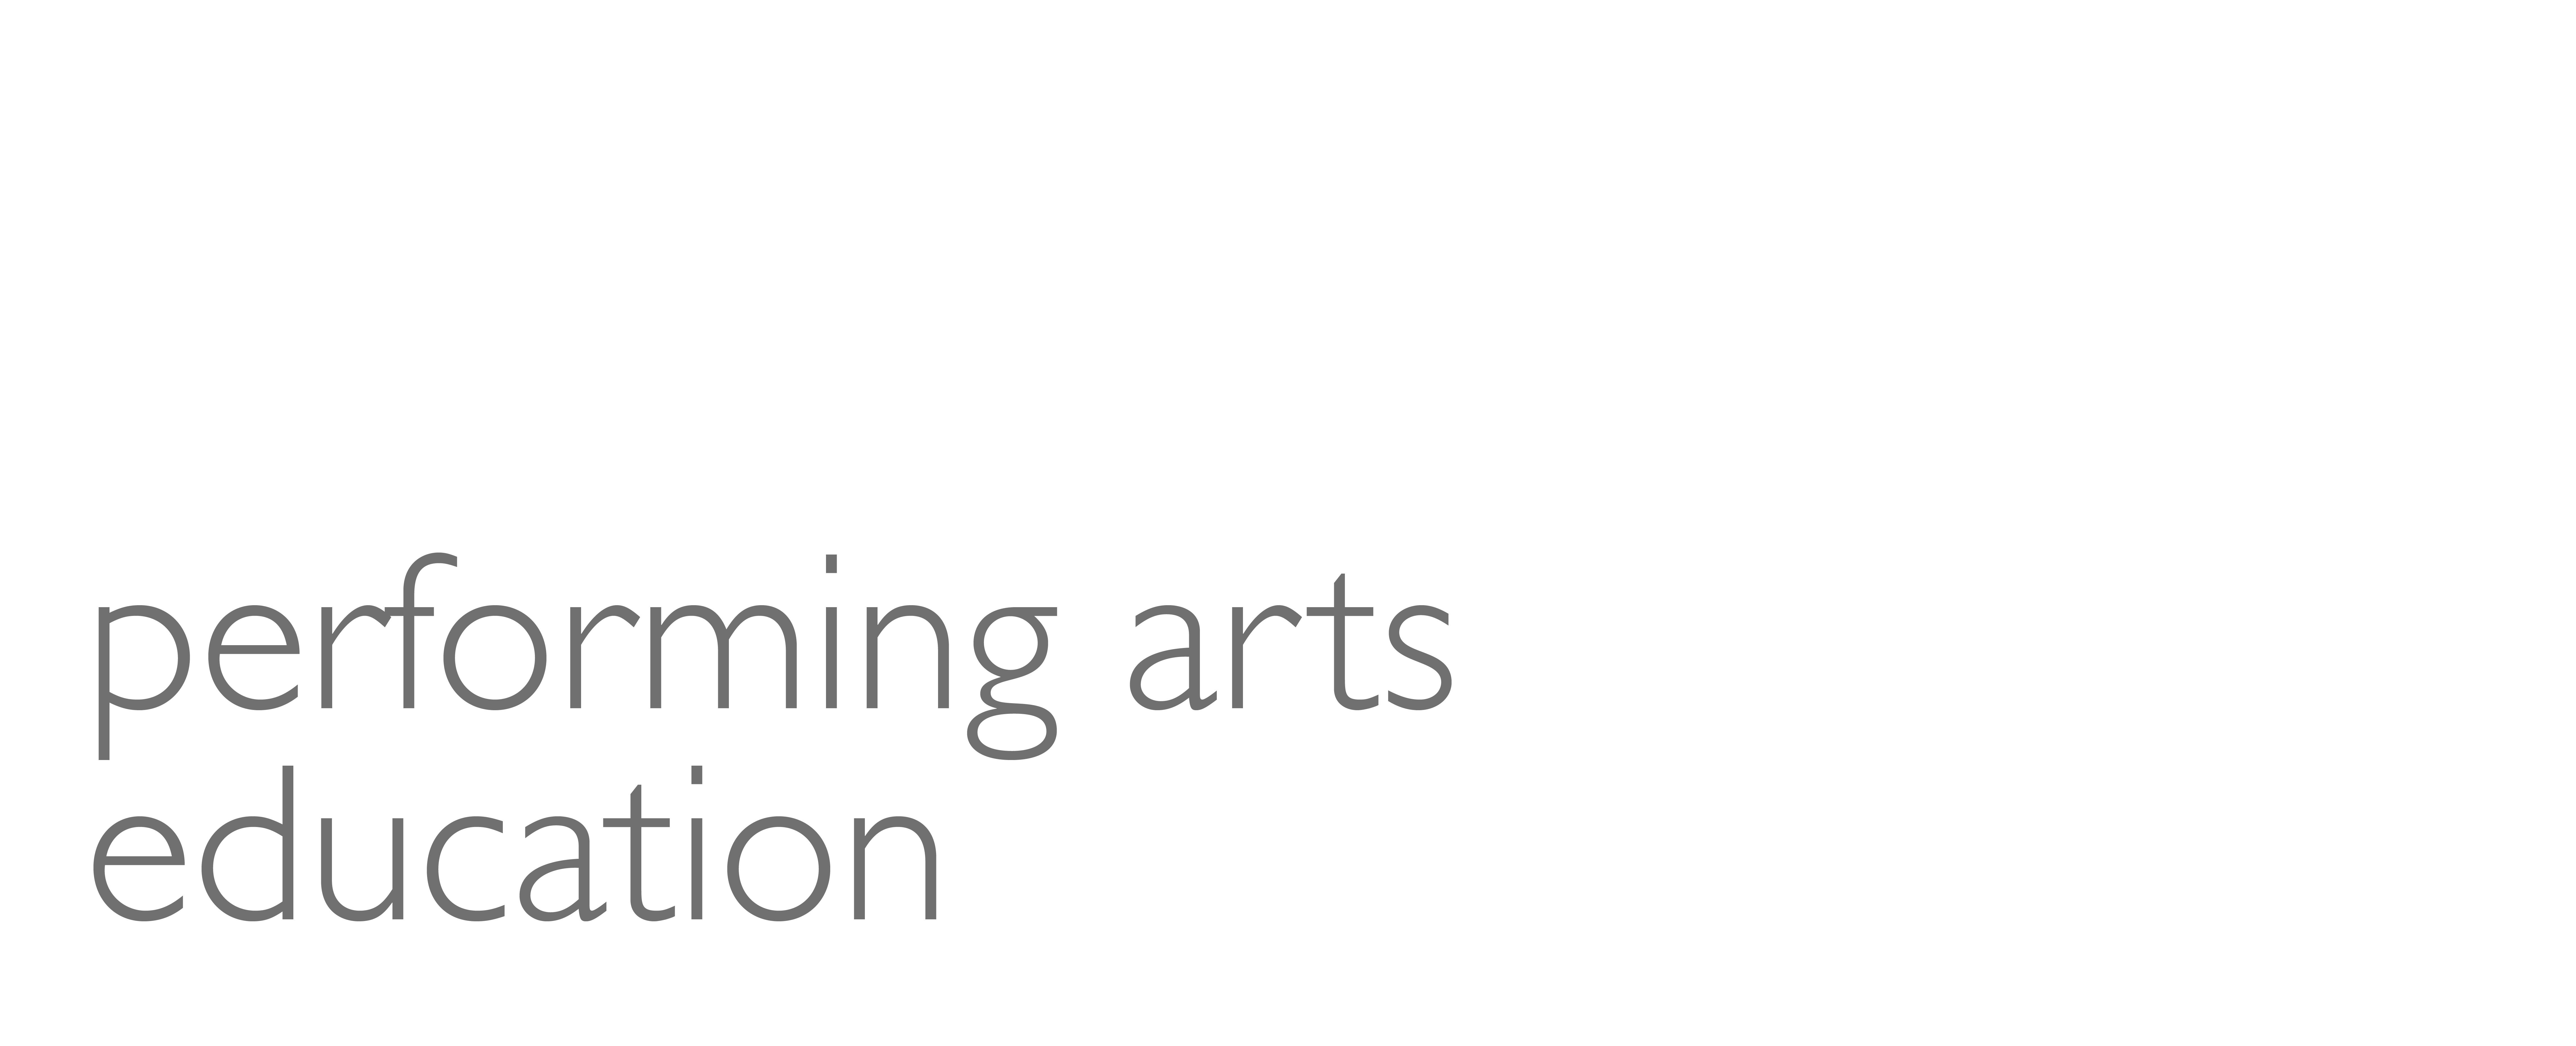 Education Plans Lack Clarity On >> Talaske Performing Arts Education